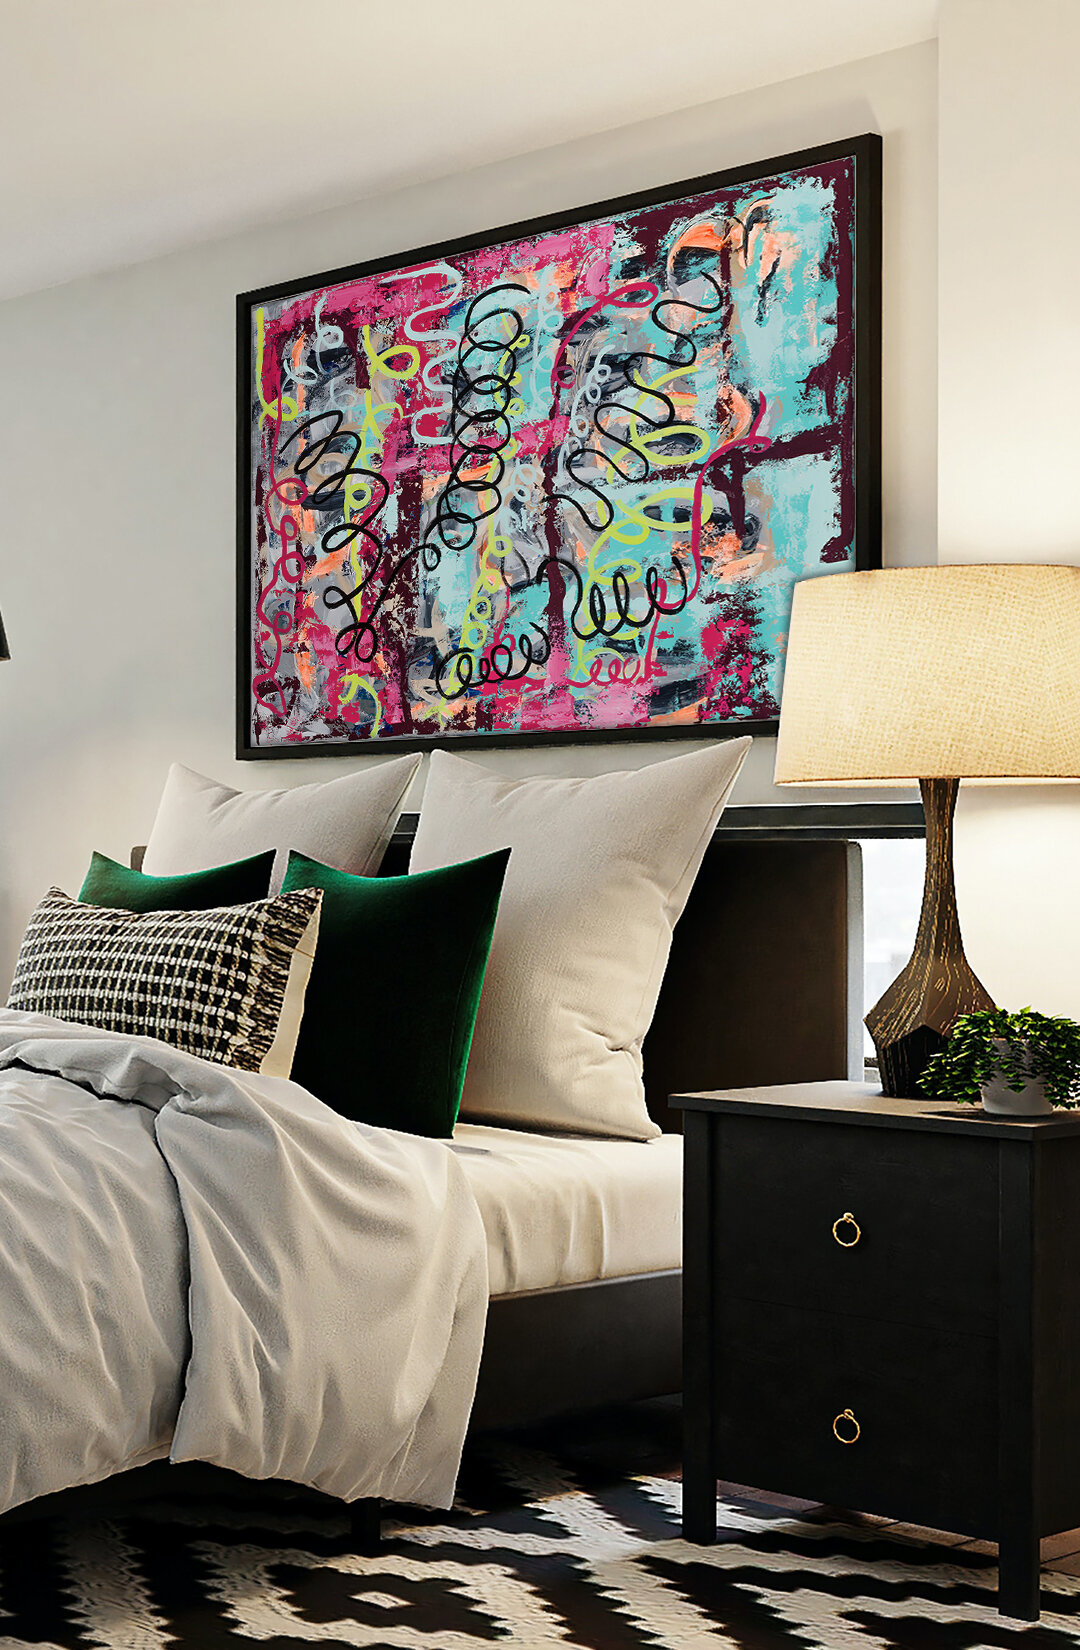 Bed room decor inspiration - contemporary art